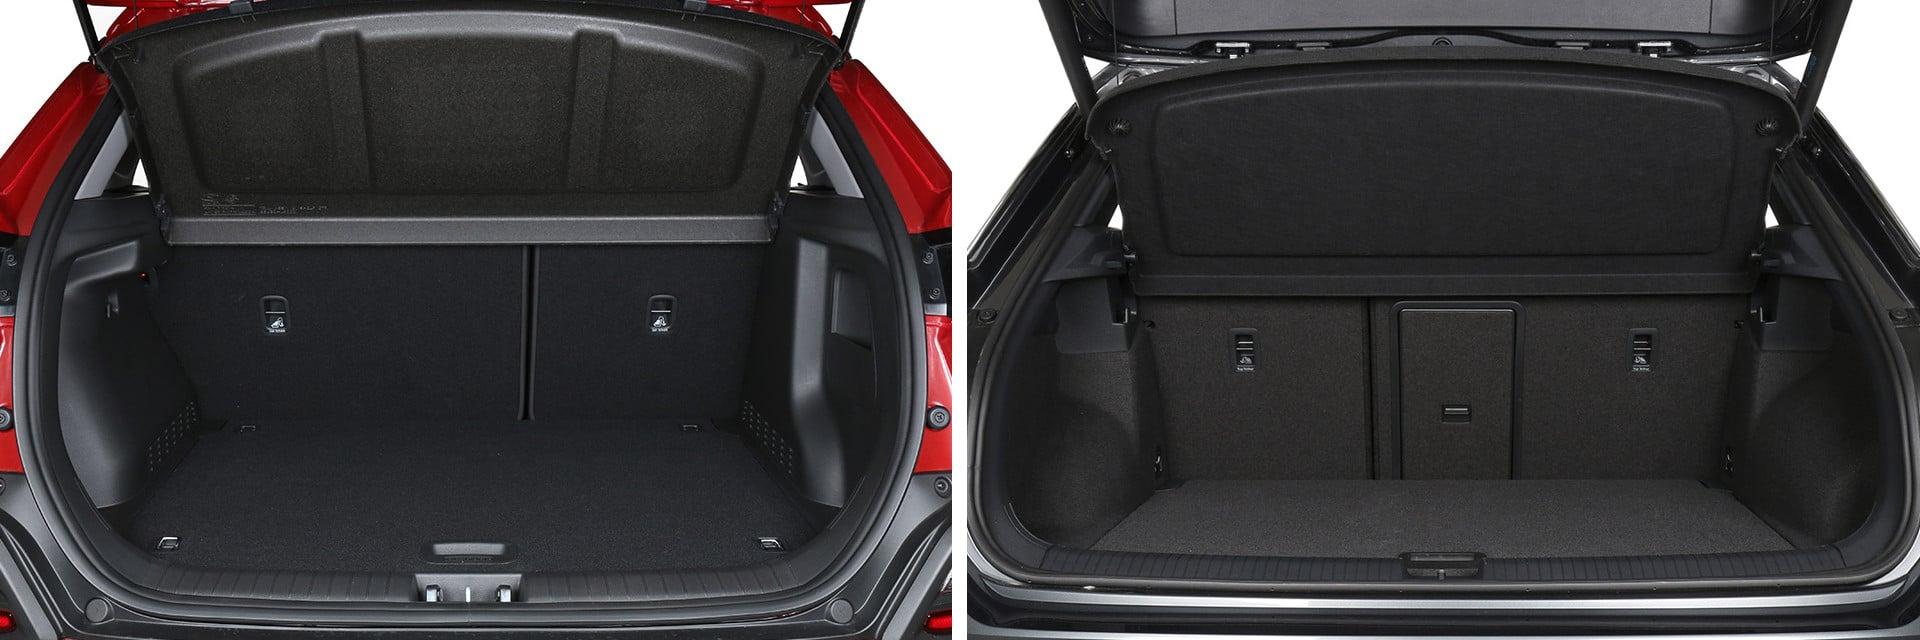 El maletero del Kona (izq.) tiene una capacidad de 361 litros; la del T-Roc (dcha.) es de 445 litros.